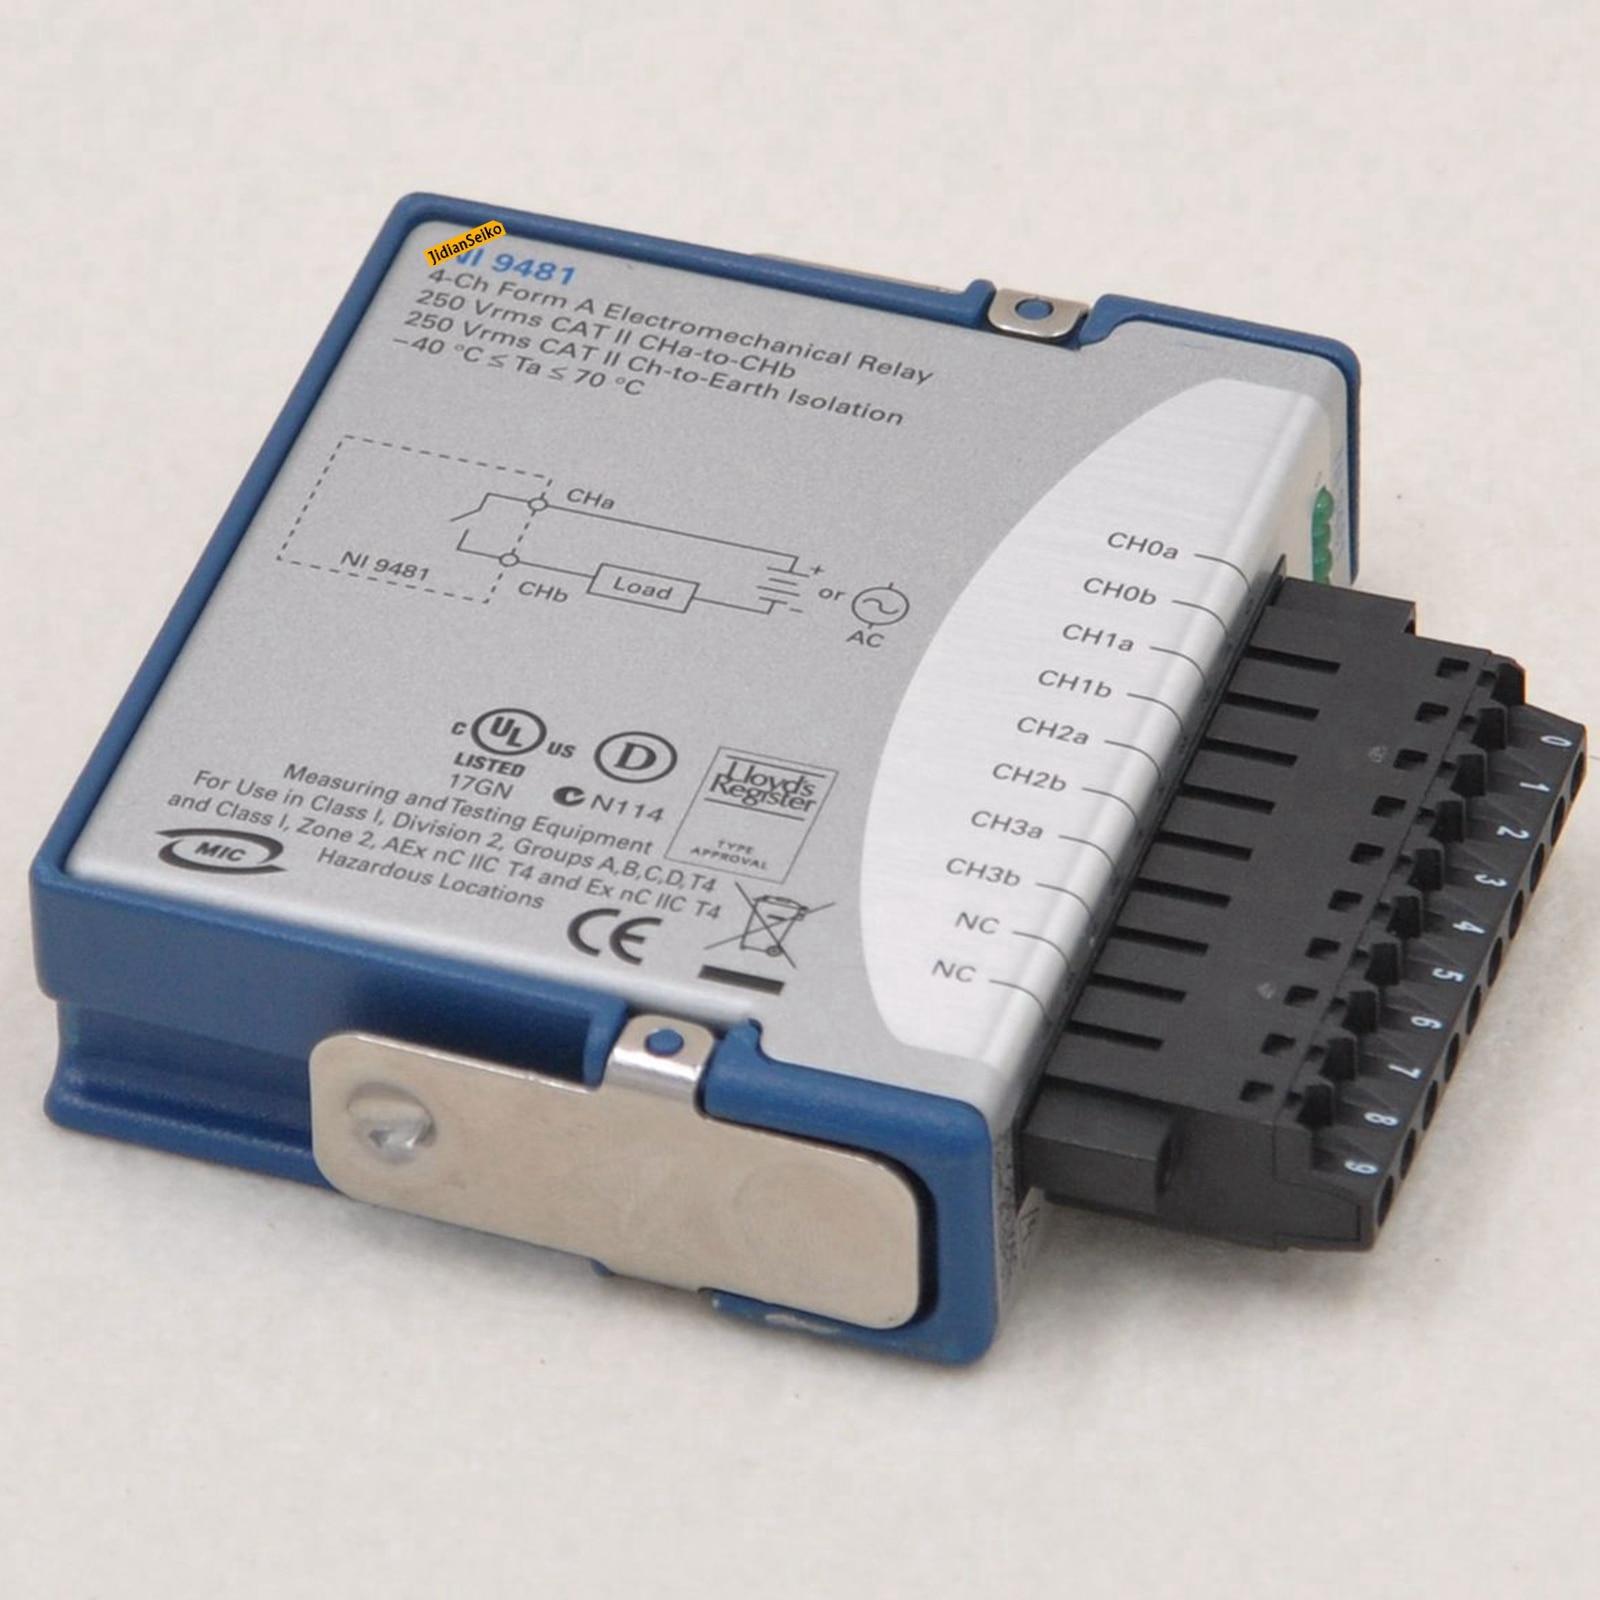 American 9481 4-channel SPST electromechanical relay module enlarge